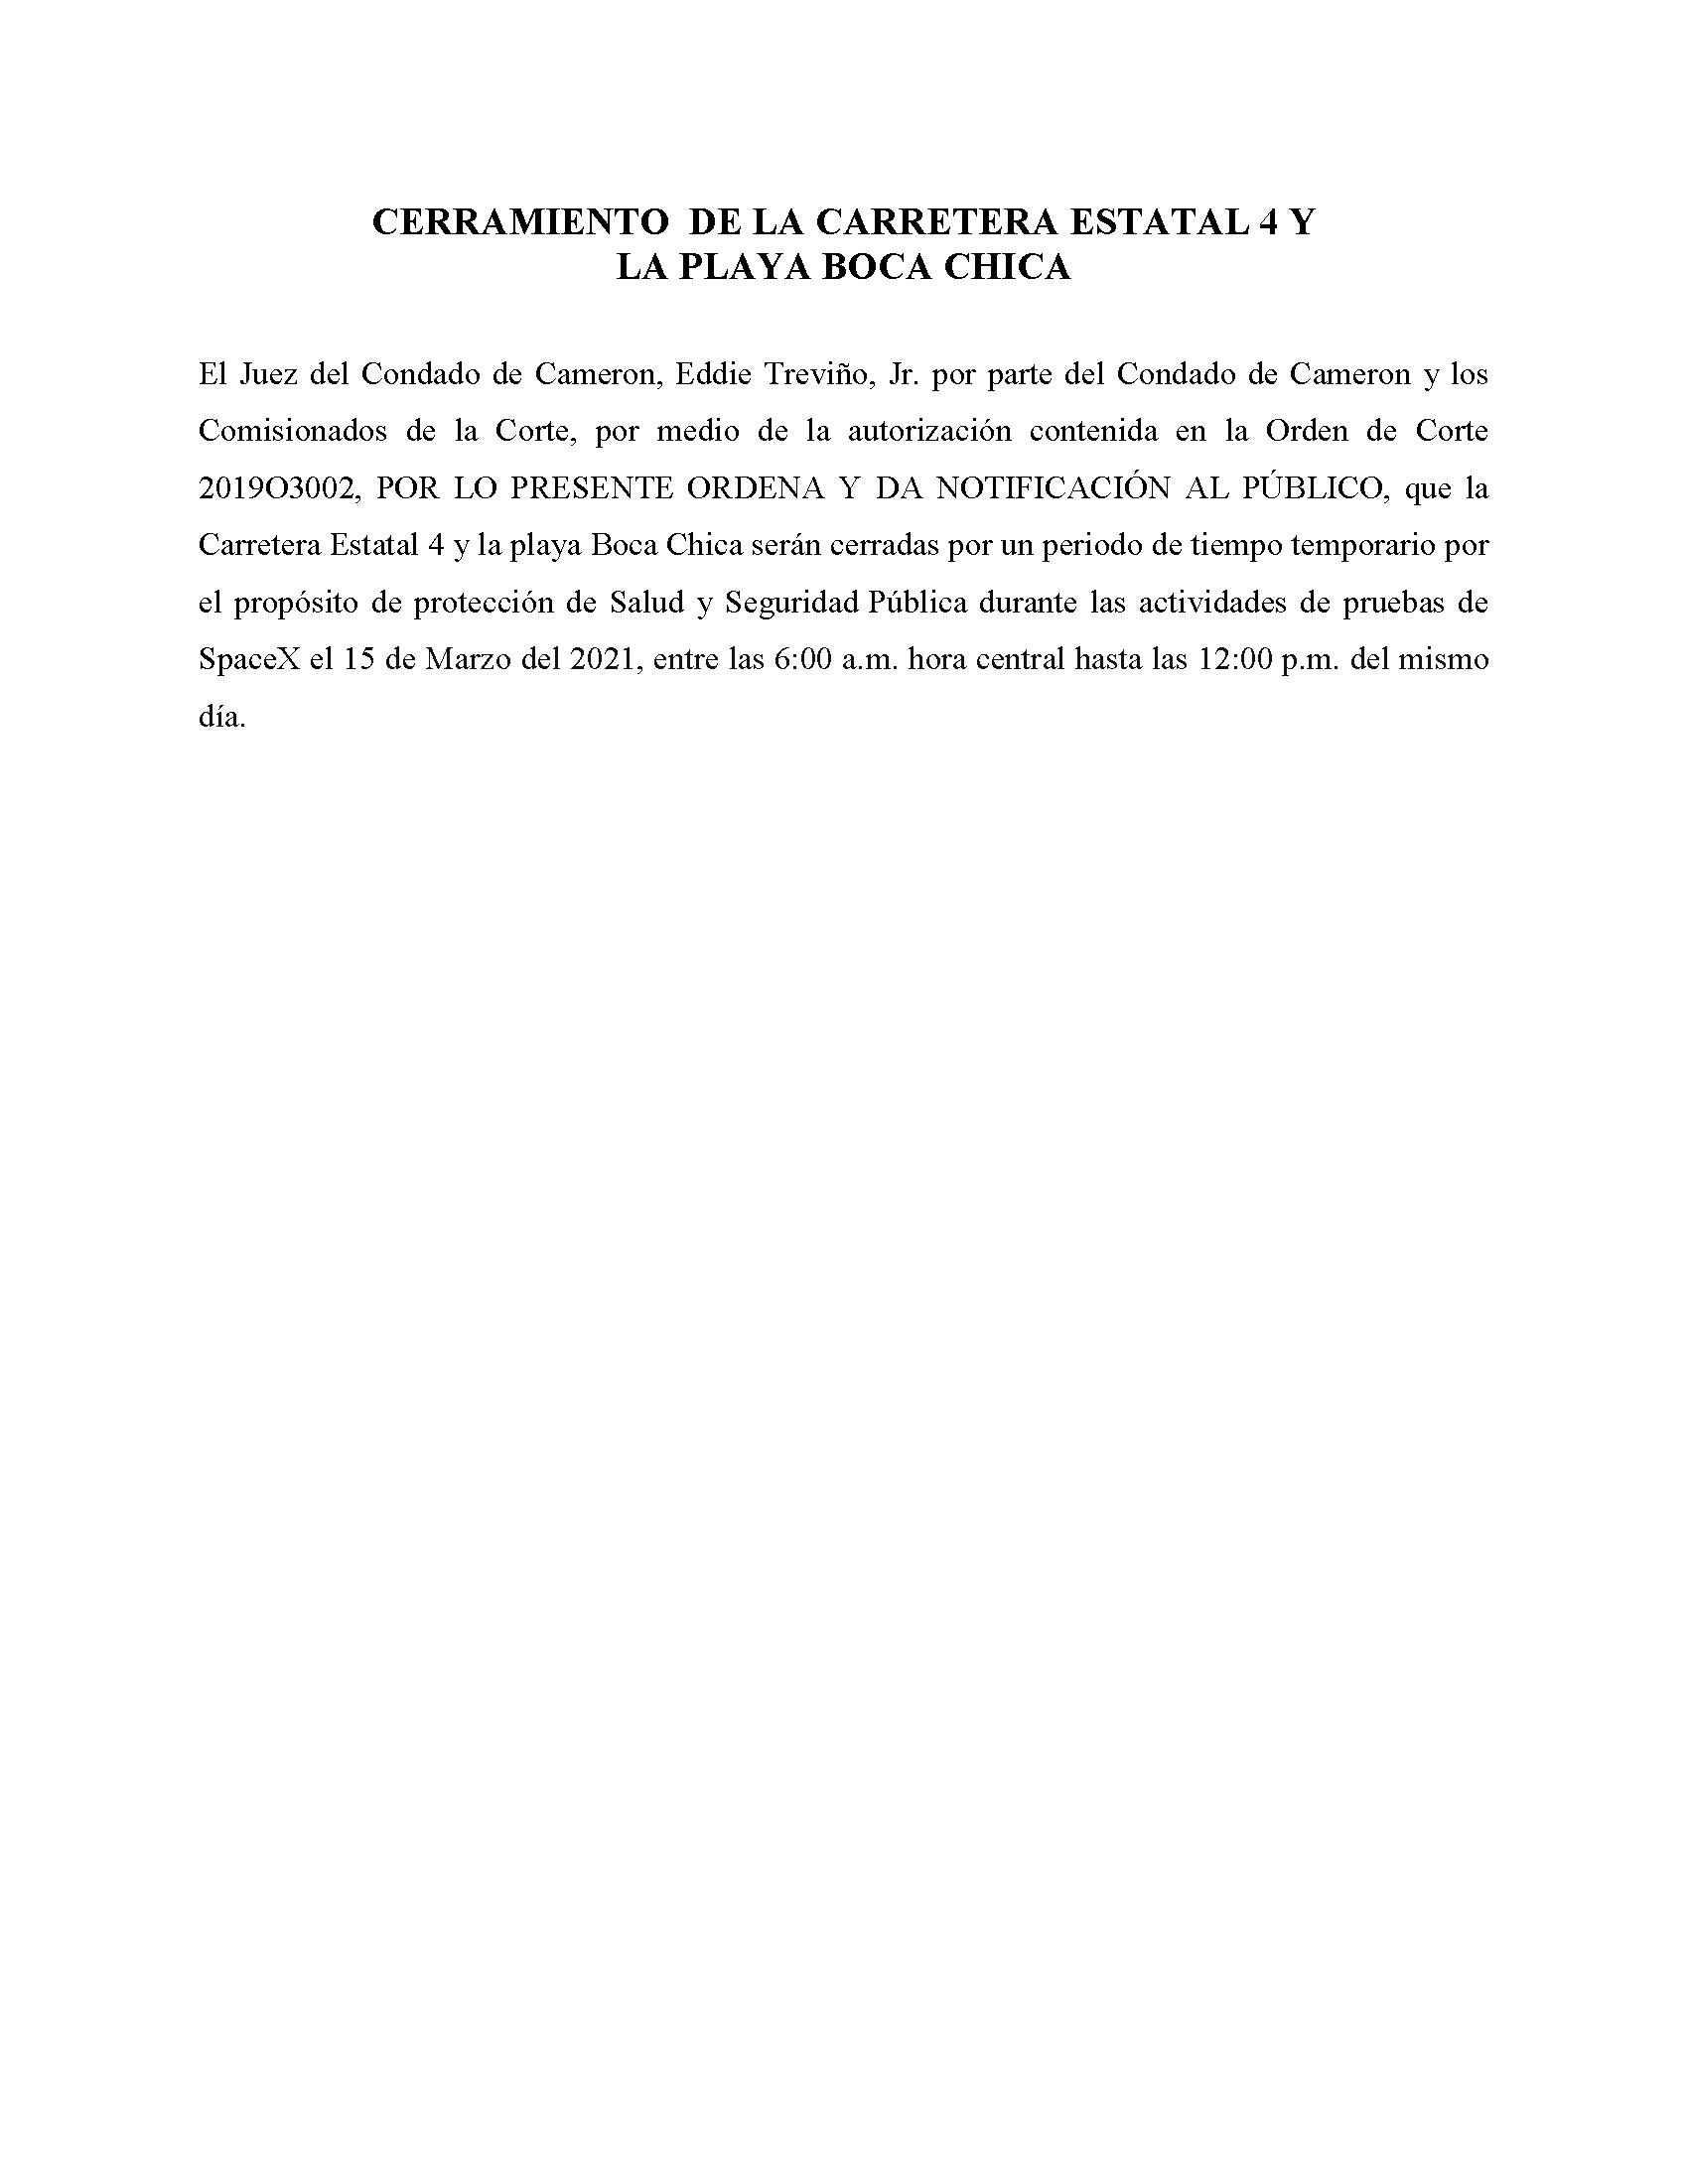 ORDER.CLOSURE OF HIGHWAY 4 Y LA PLAYA BOCA CHICA.SPANISH.03.15.2021